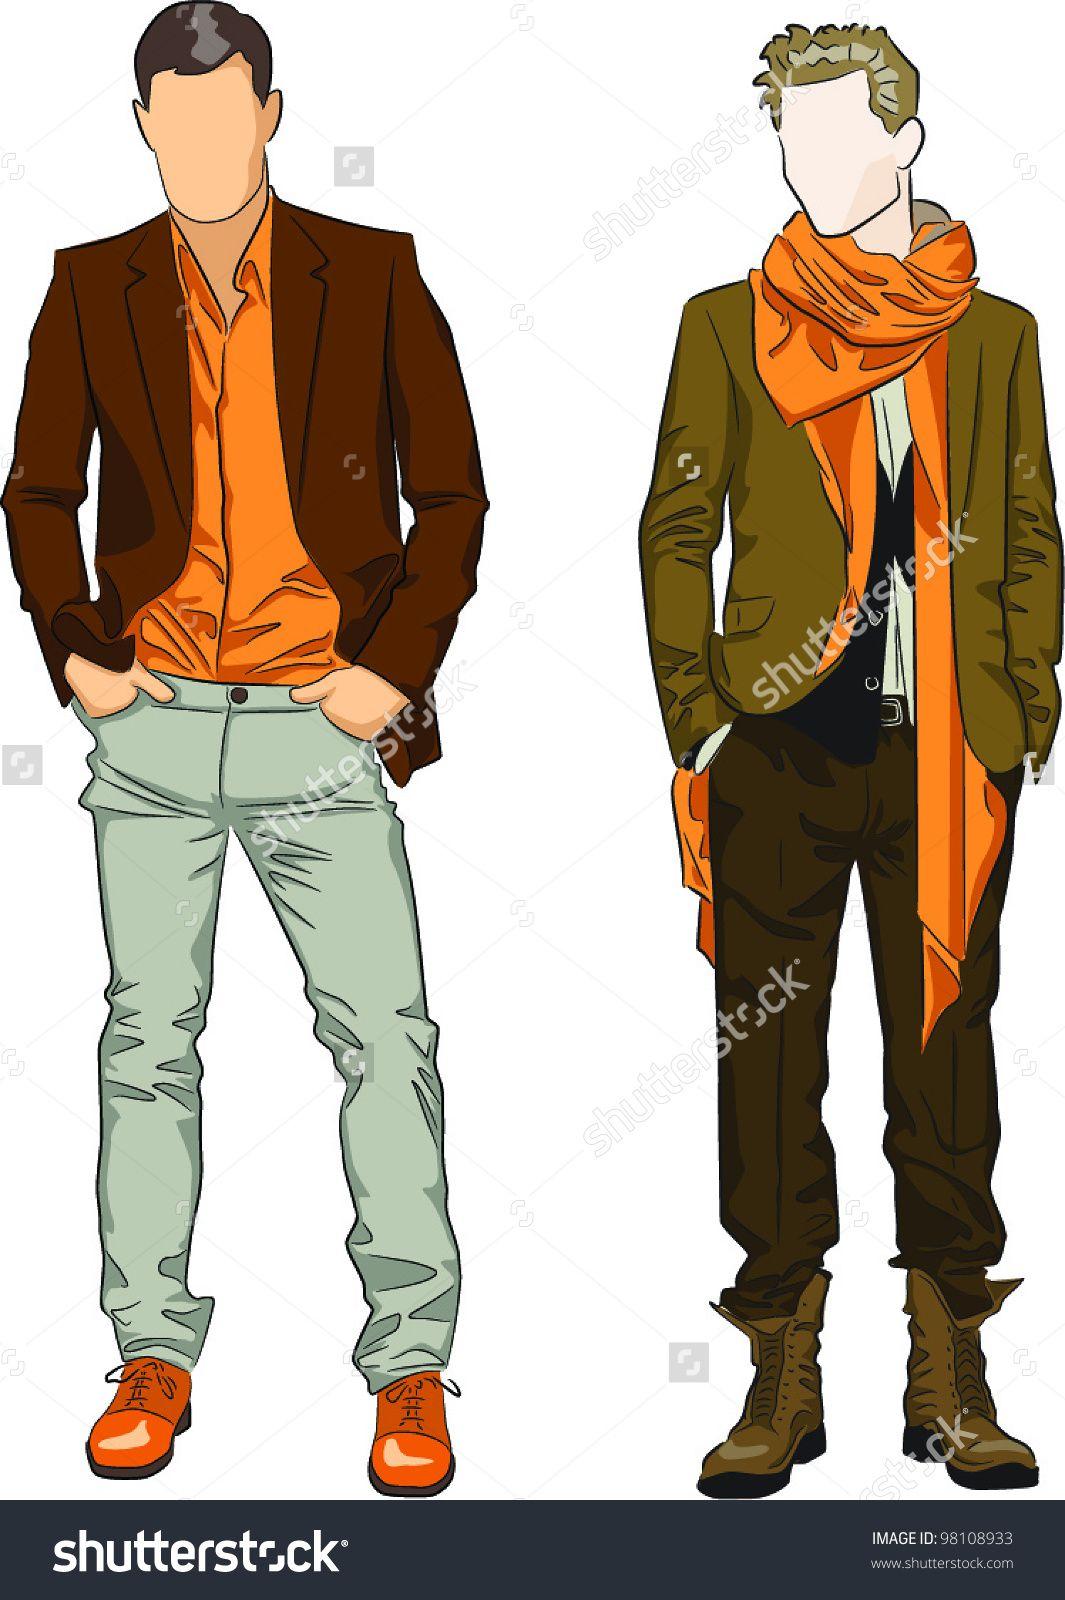 Male fashion template.